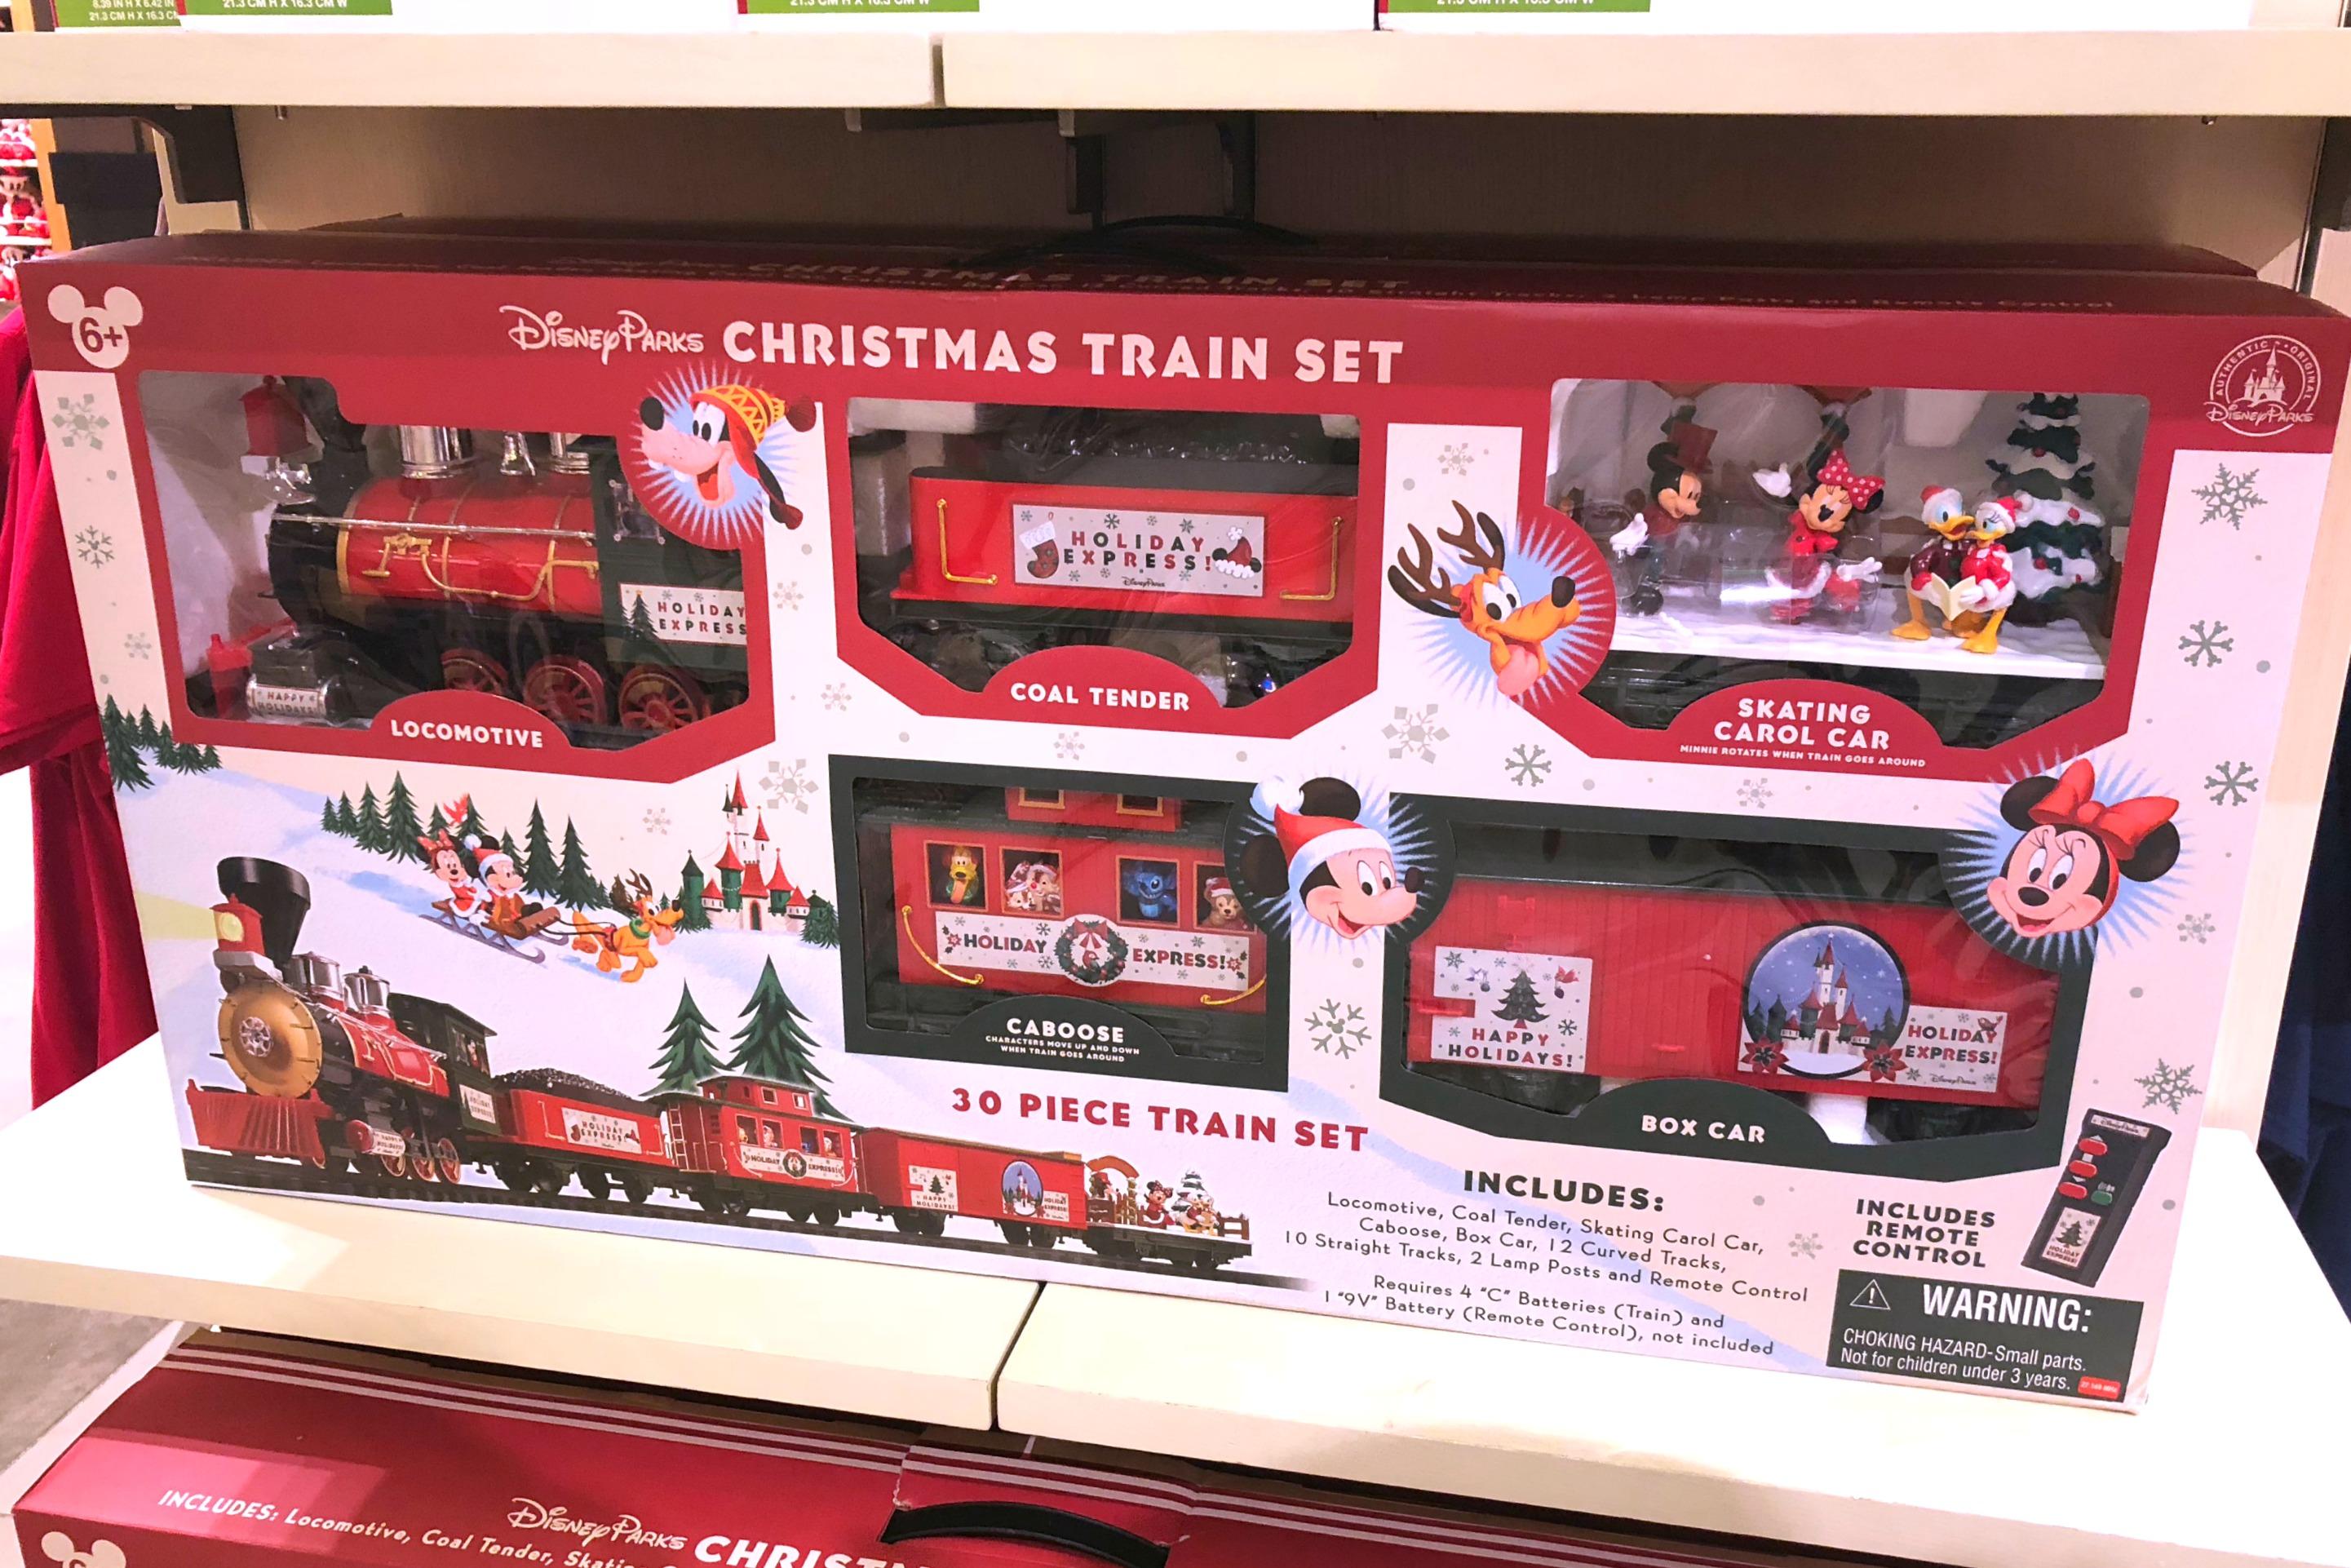 Disneyland Holidays - Merchandise - Holiday Train